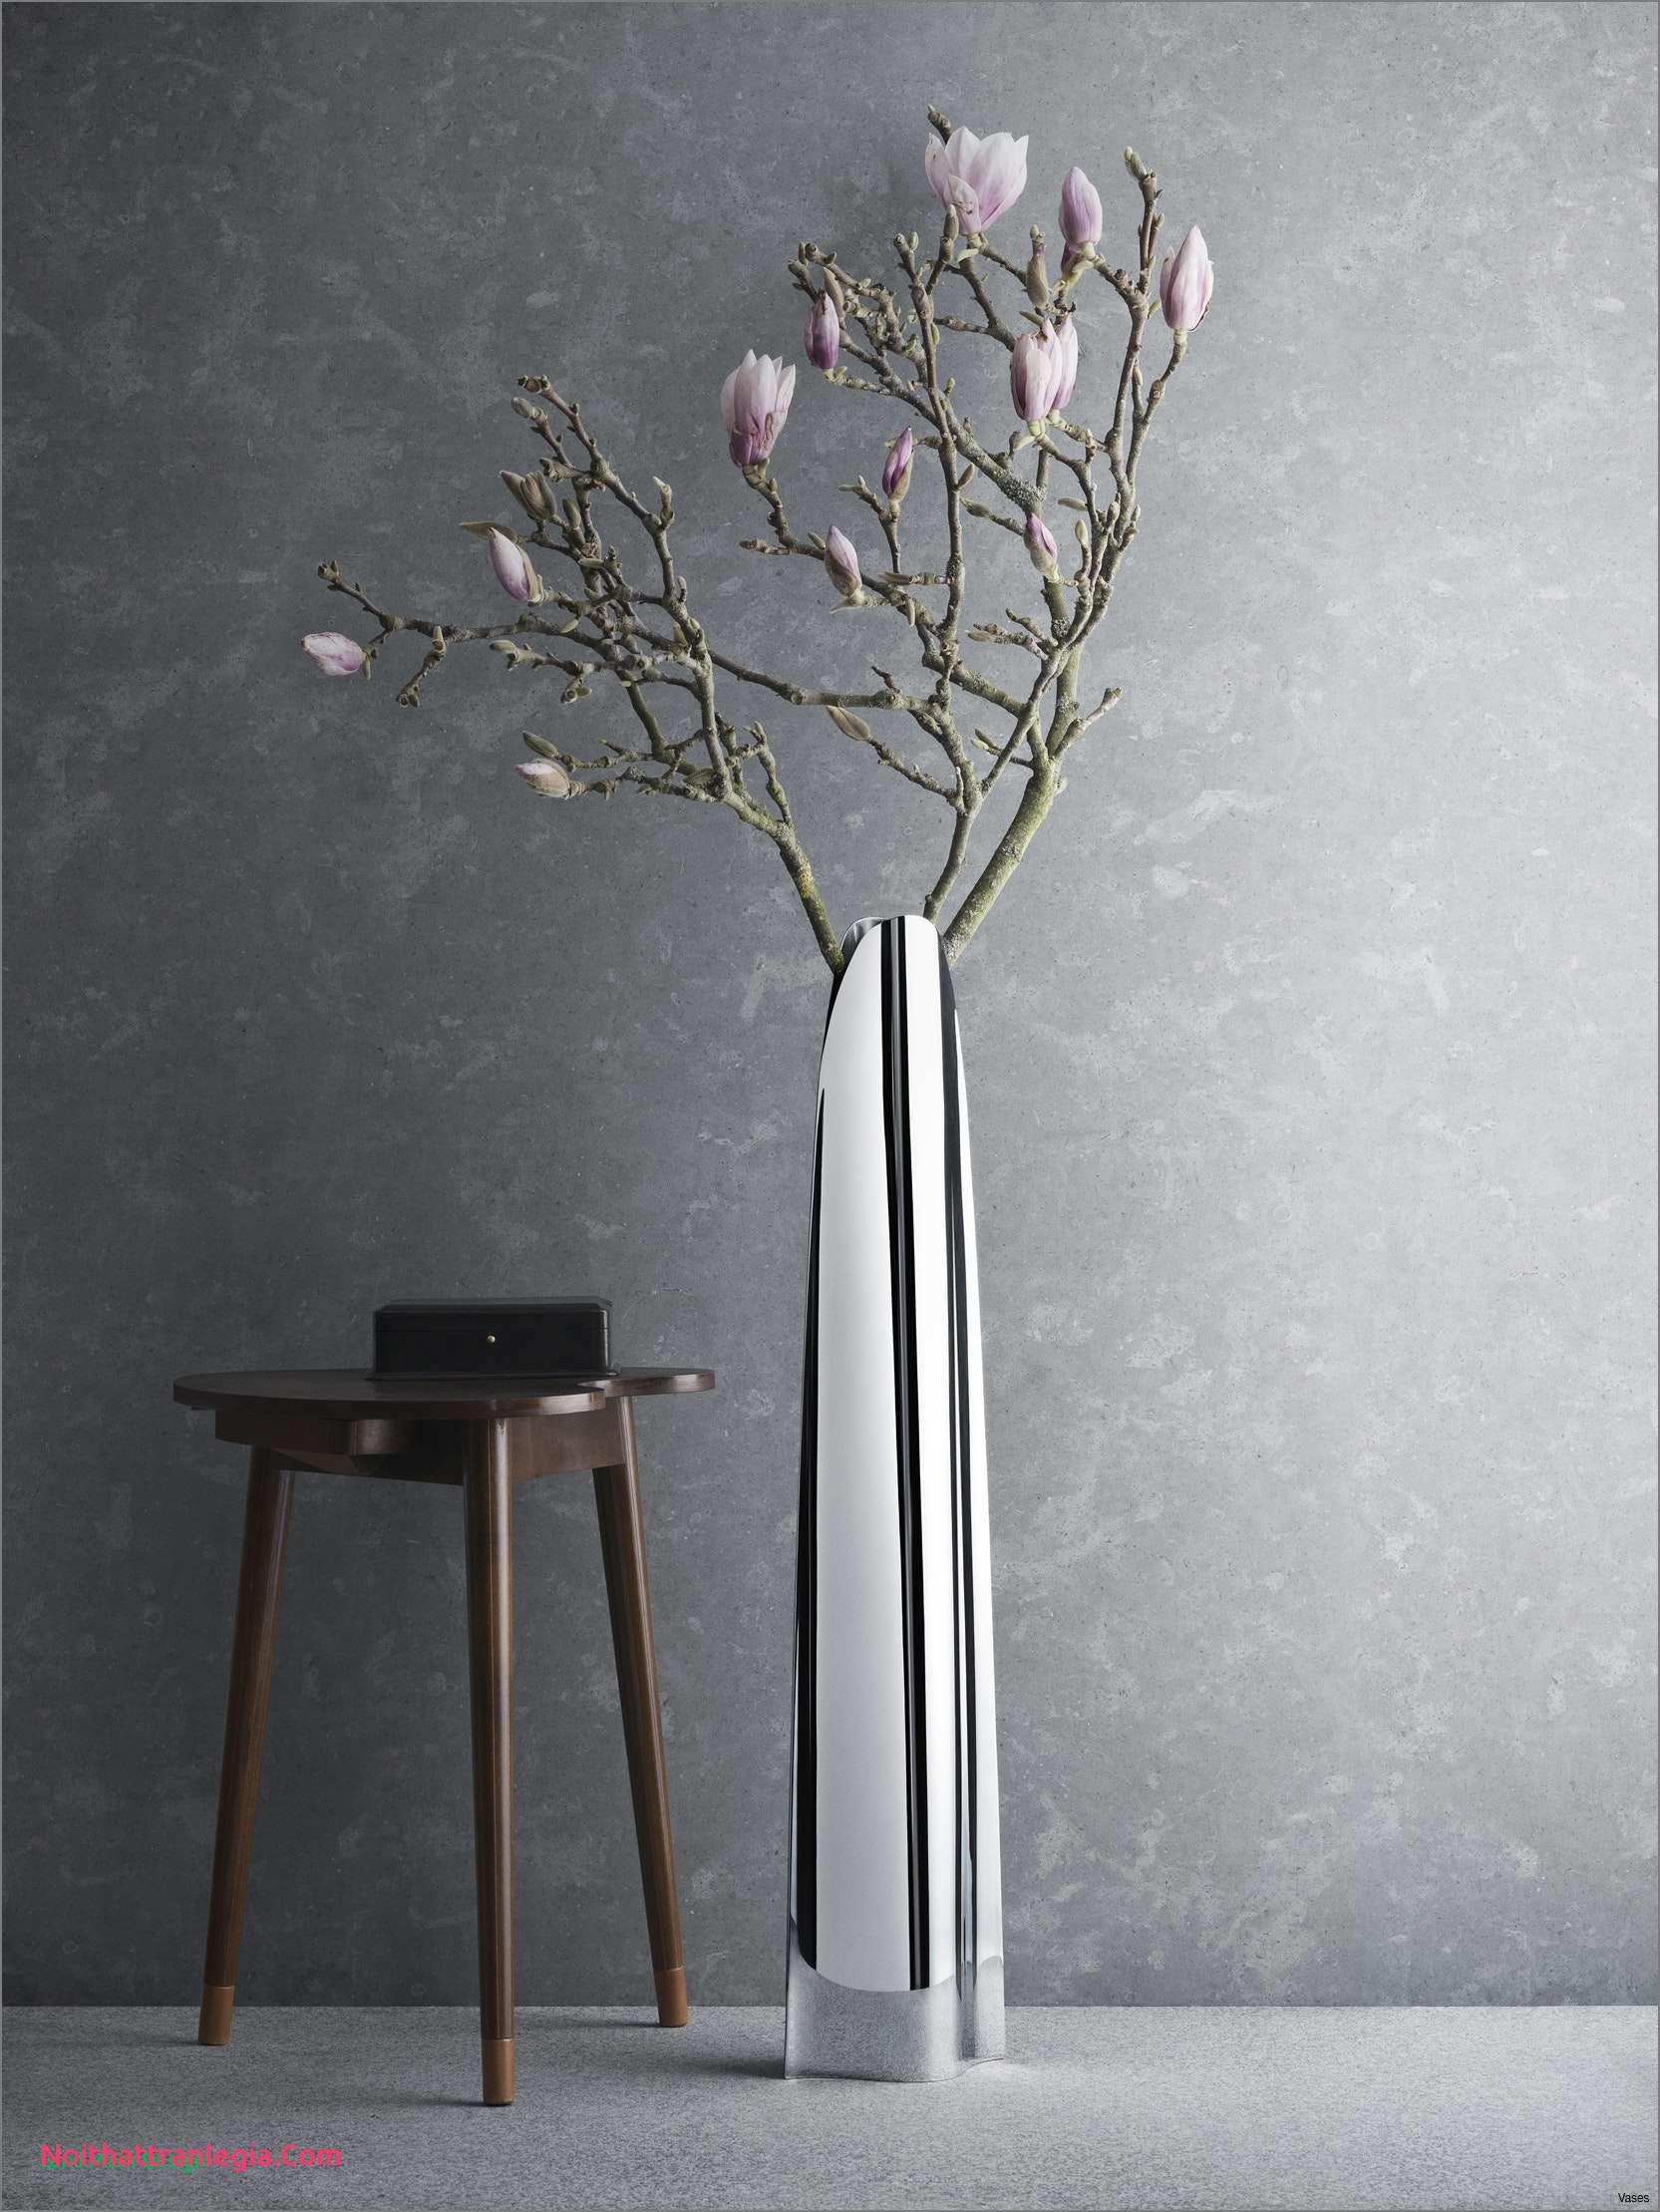 tall floor vase ideas of 20 large floor vase nz noithattranlegia vases design with regard to appealing modern floor vases 144 silver floorh contemporary vase full sizei 0d